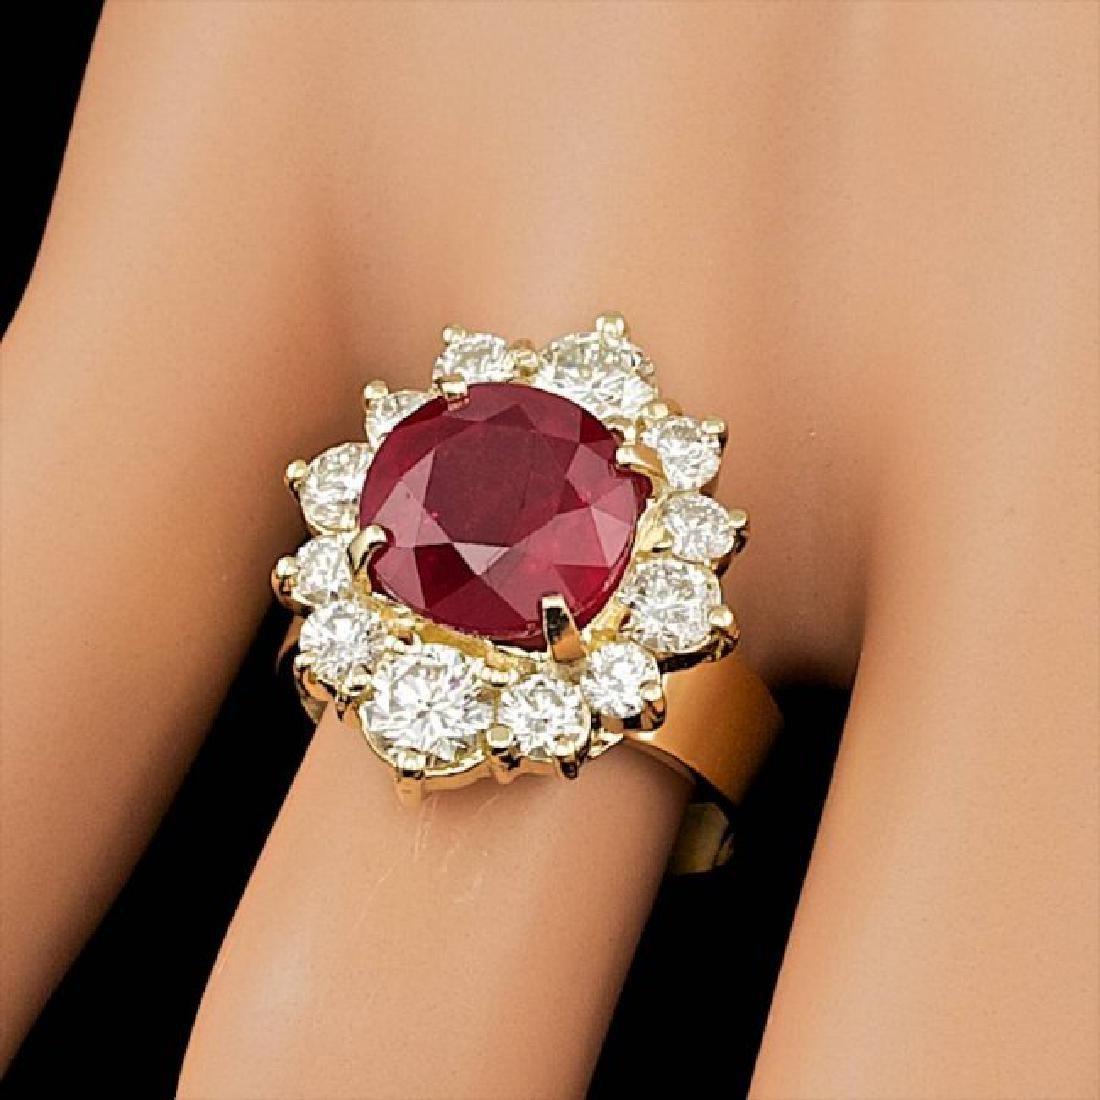 14k Yellow Gold 5.50ct Ruby 1.85ct Diamond Ring - 3